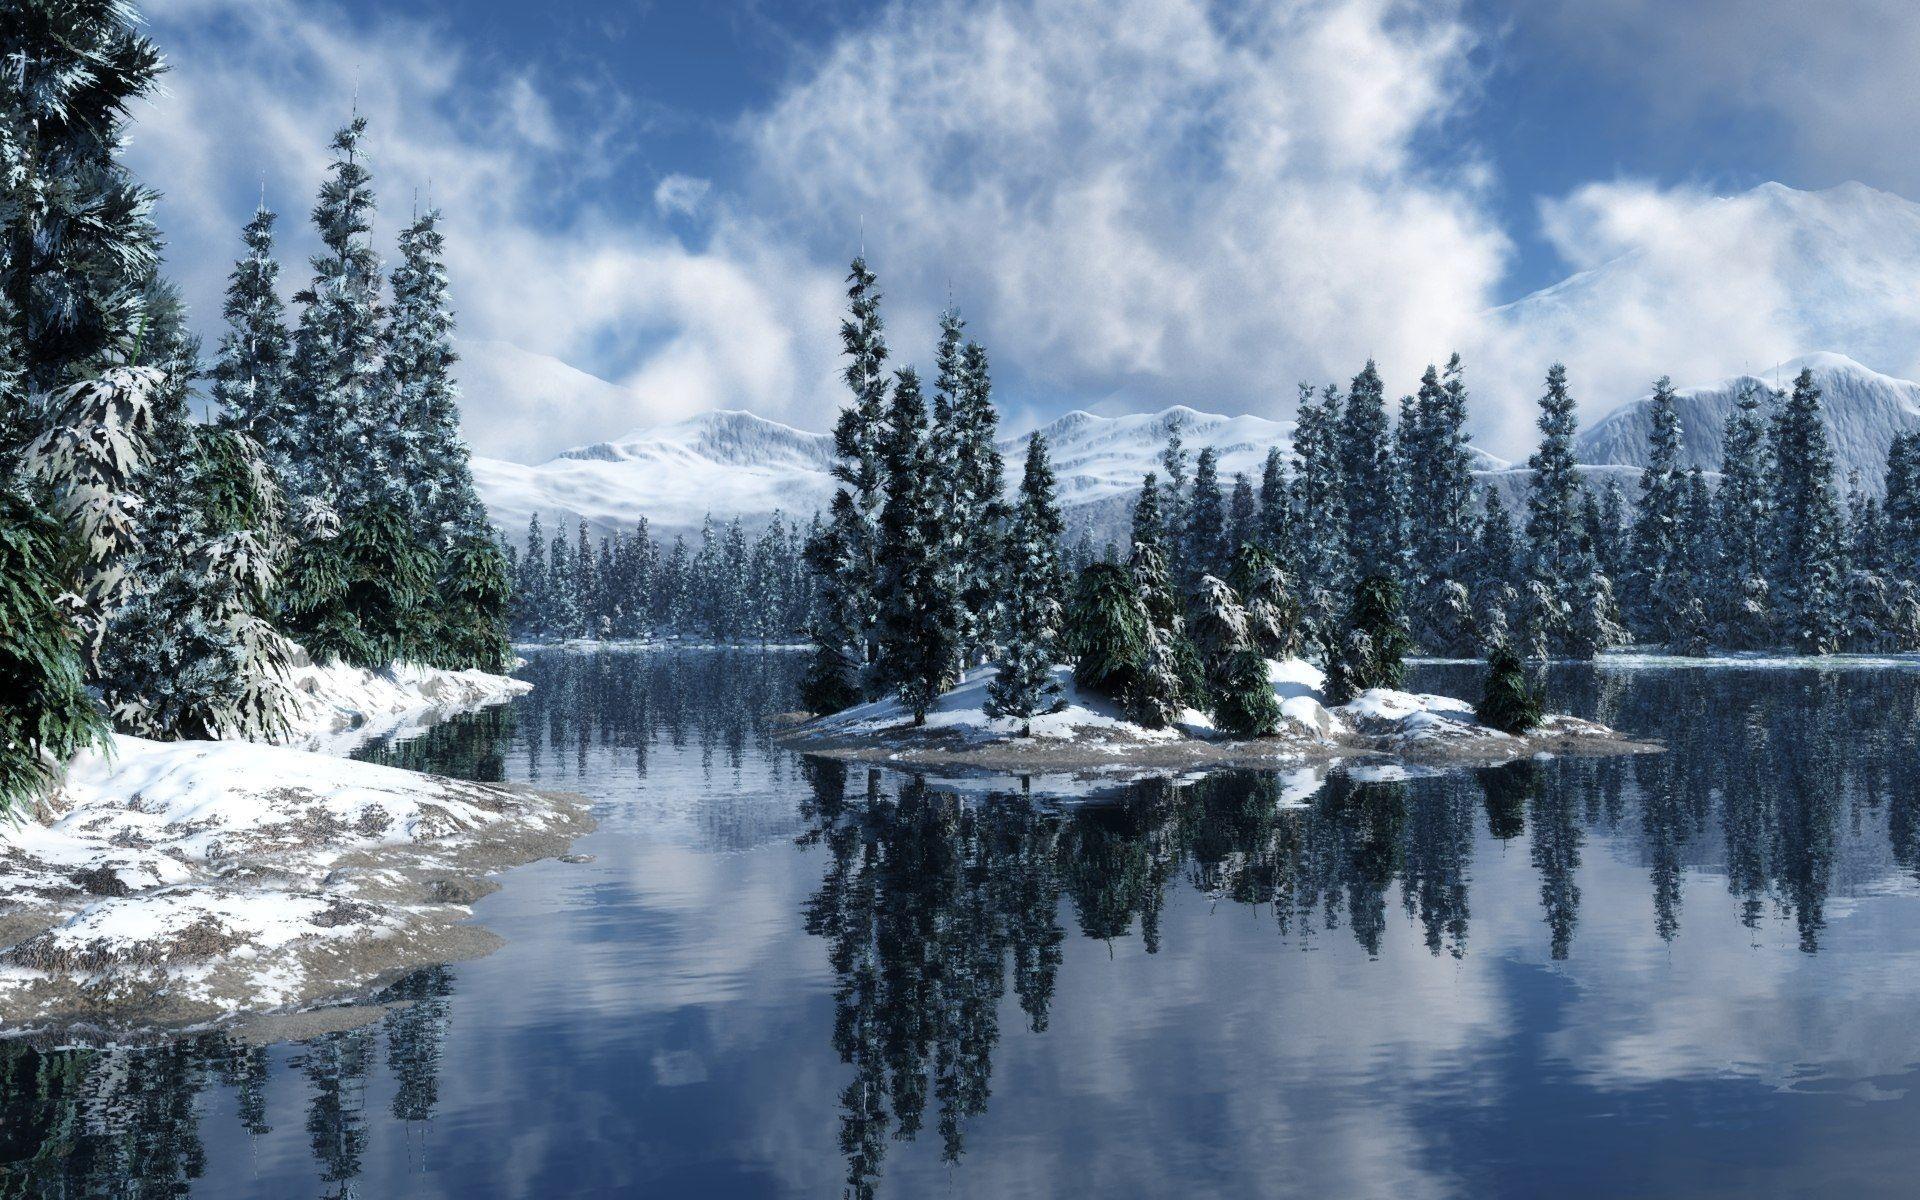 Snowy Pine Forest Wallpaper HD : Nature Wallpaper – Sprksam.com